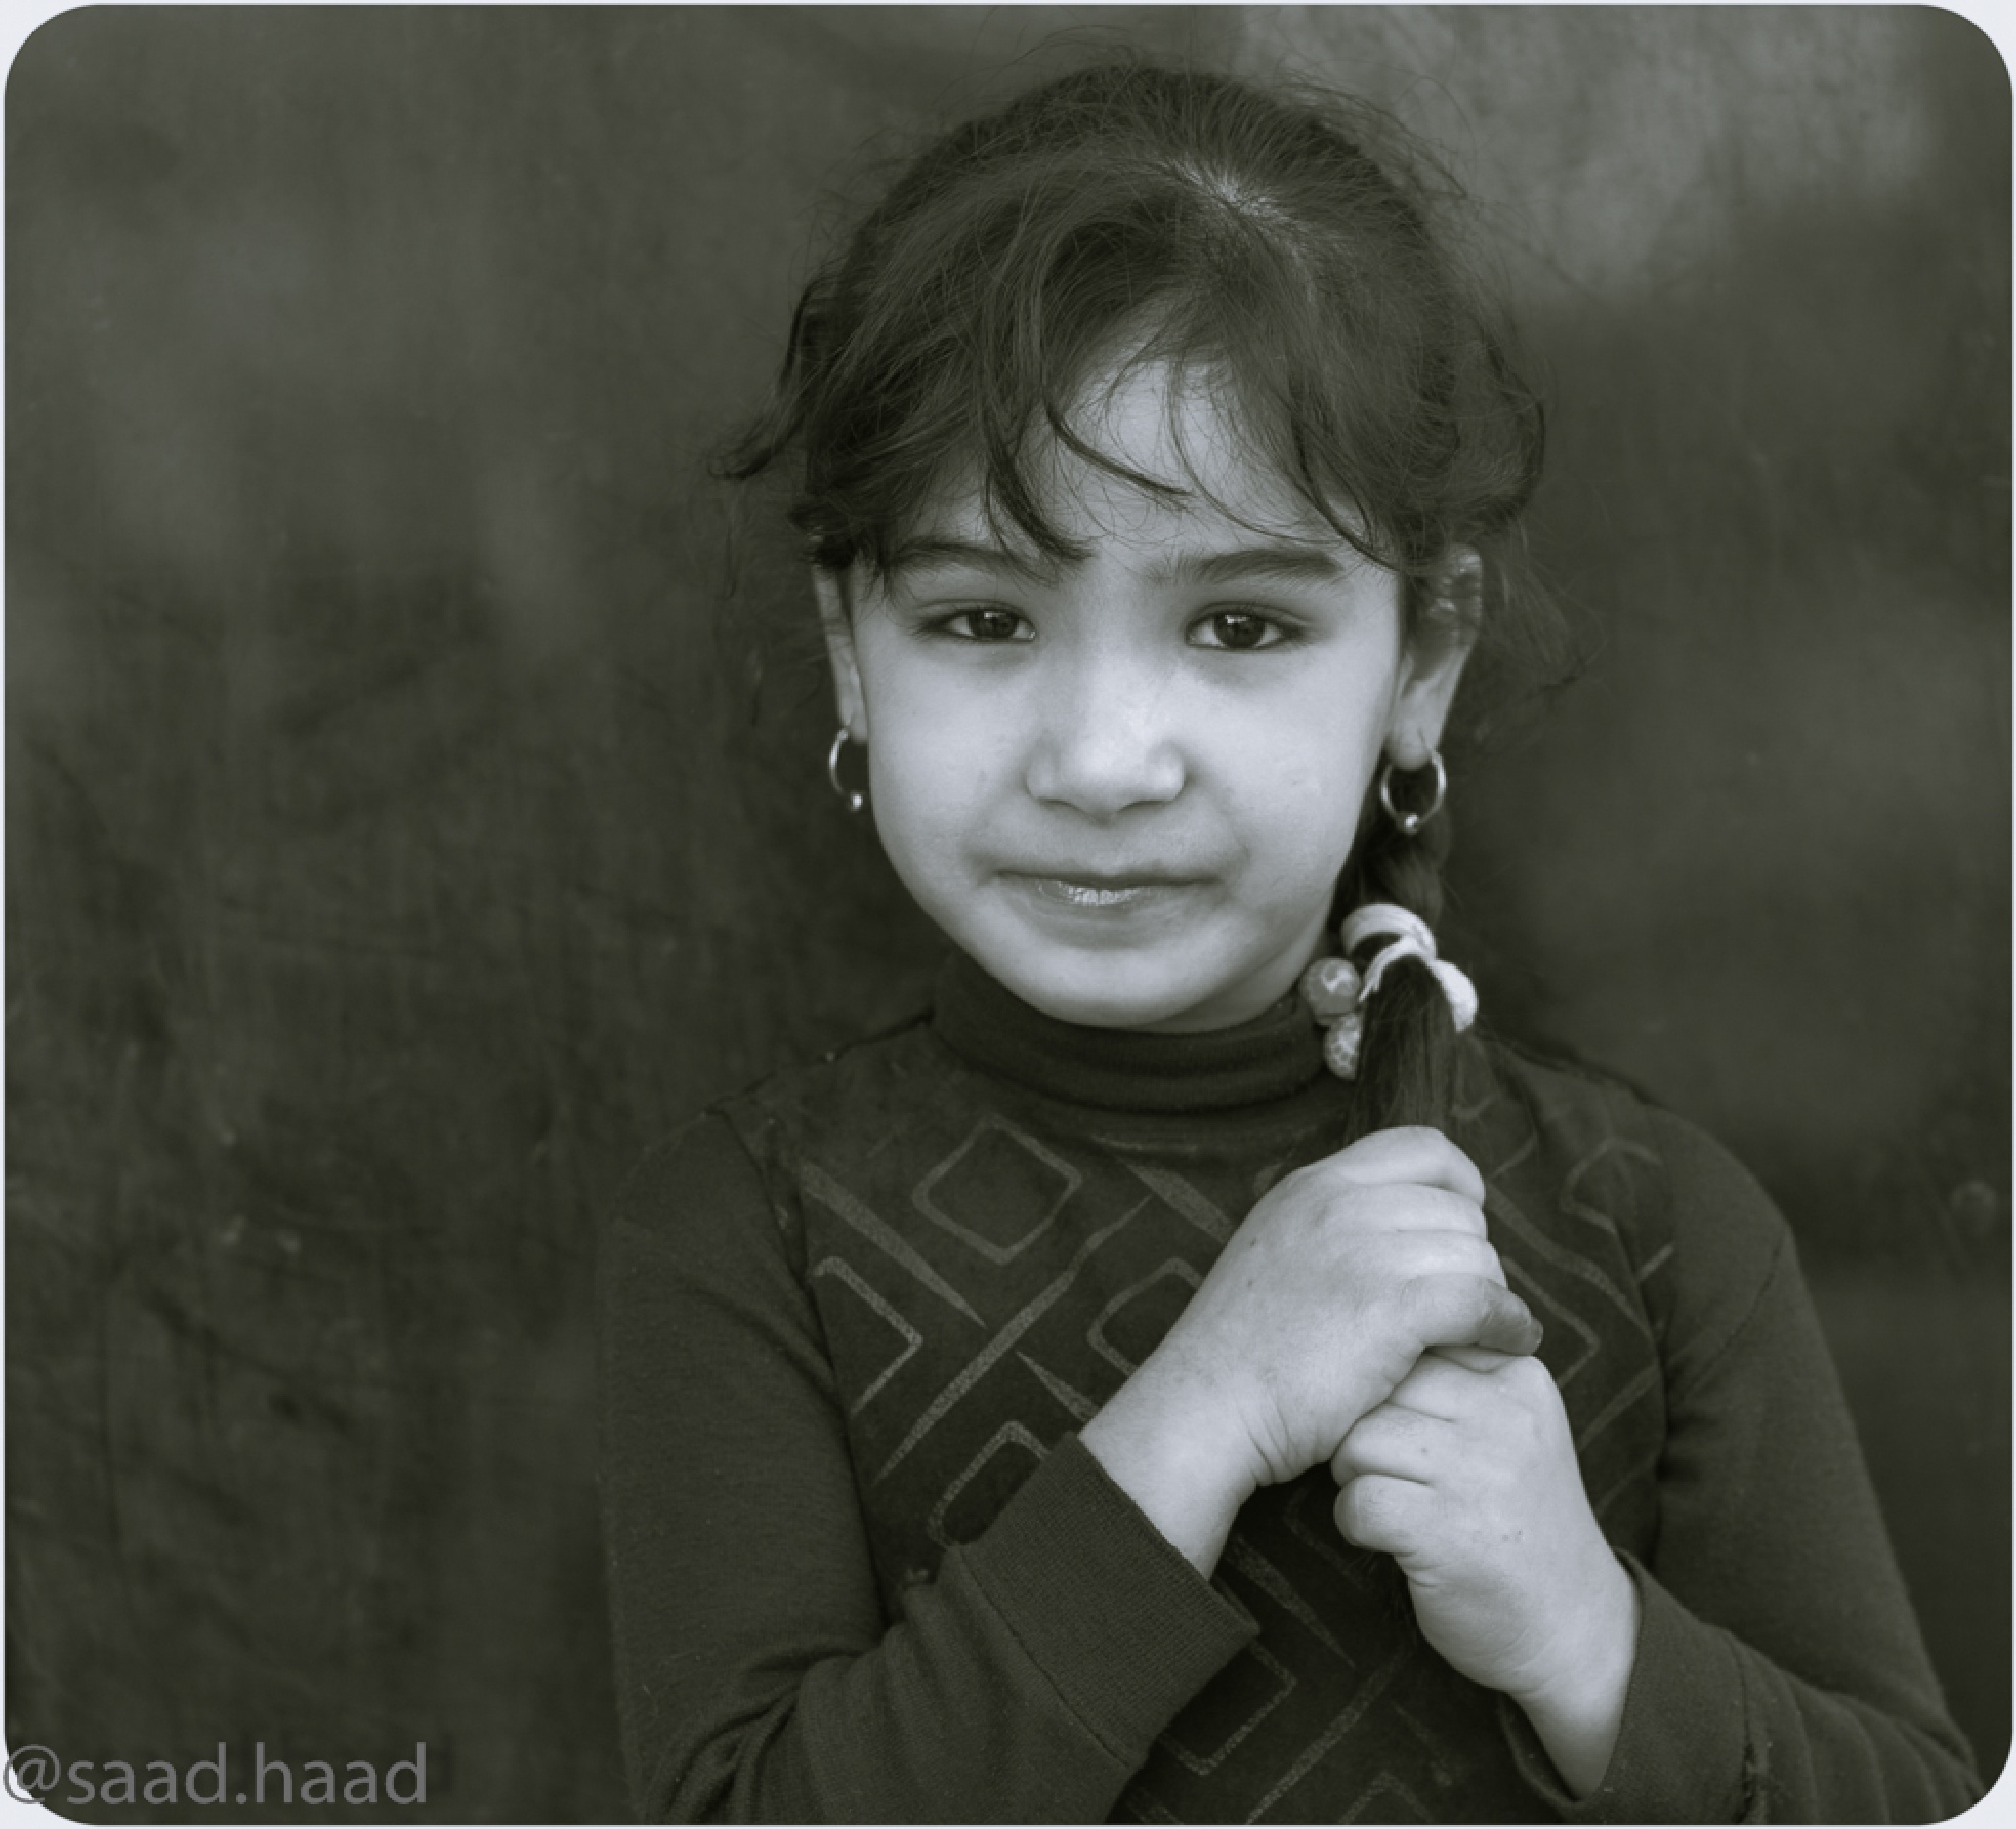 portrait by saadhaadrifai